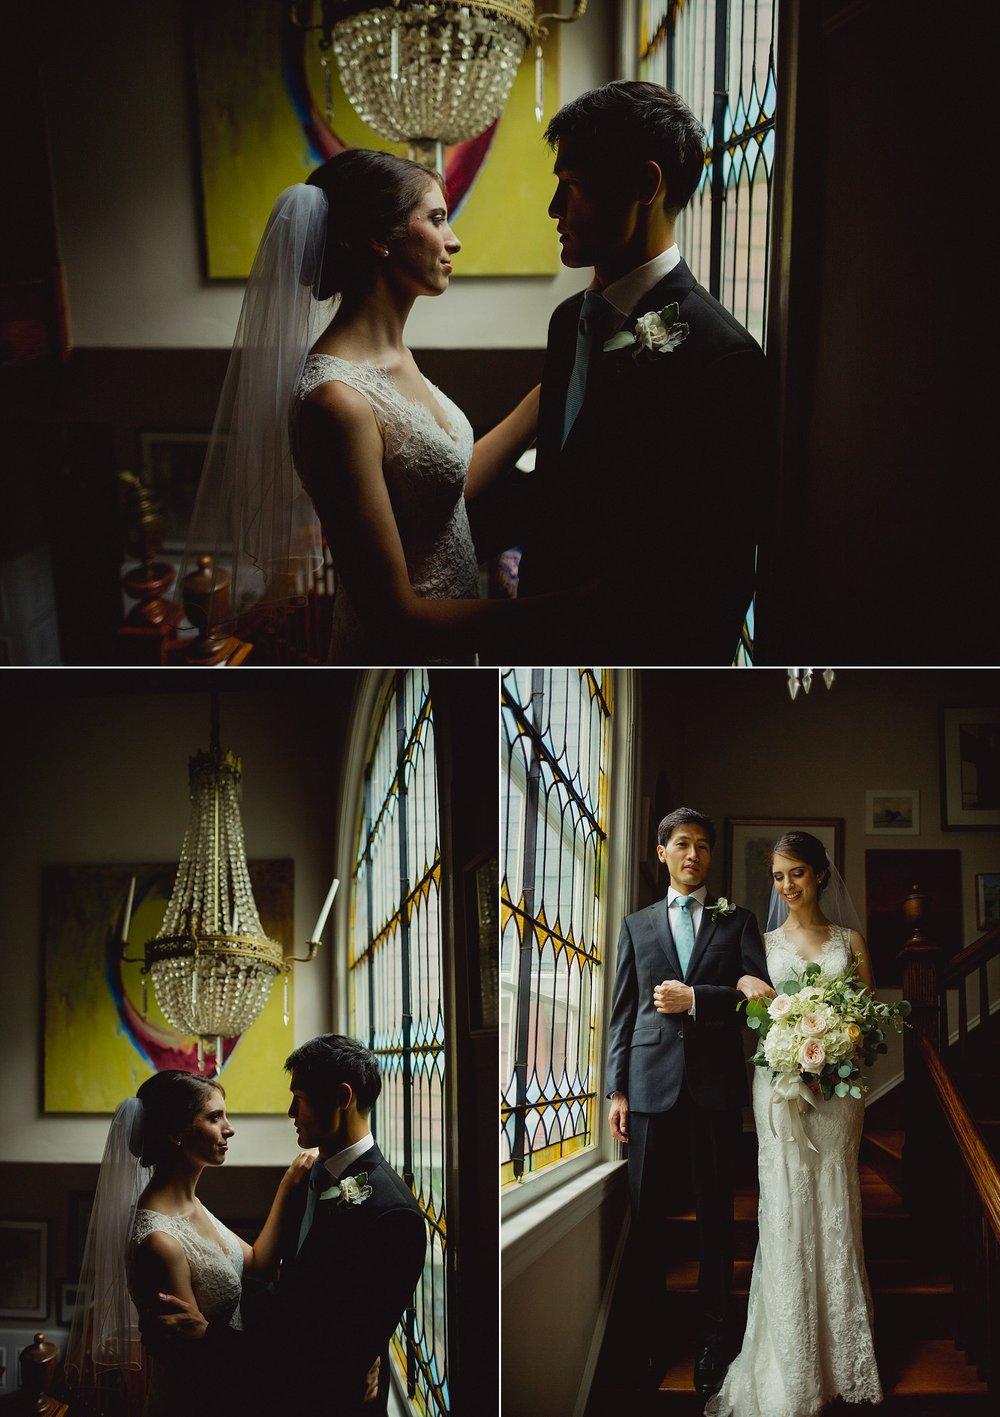 Venezia wedding Boston-30.jpg